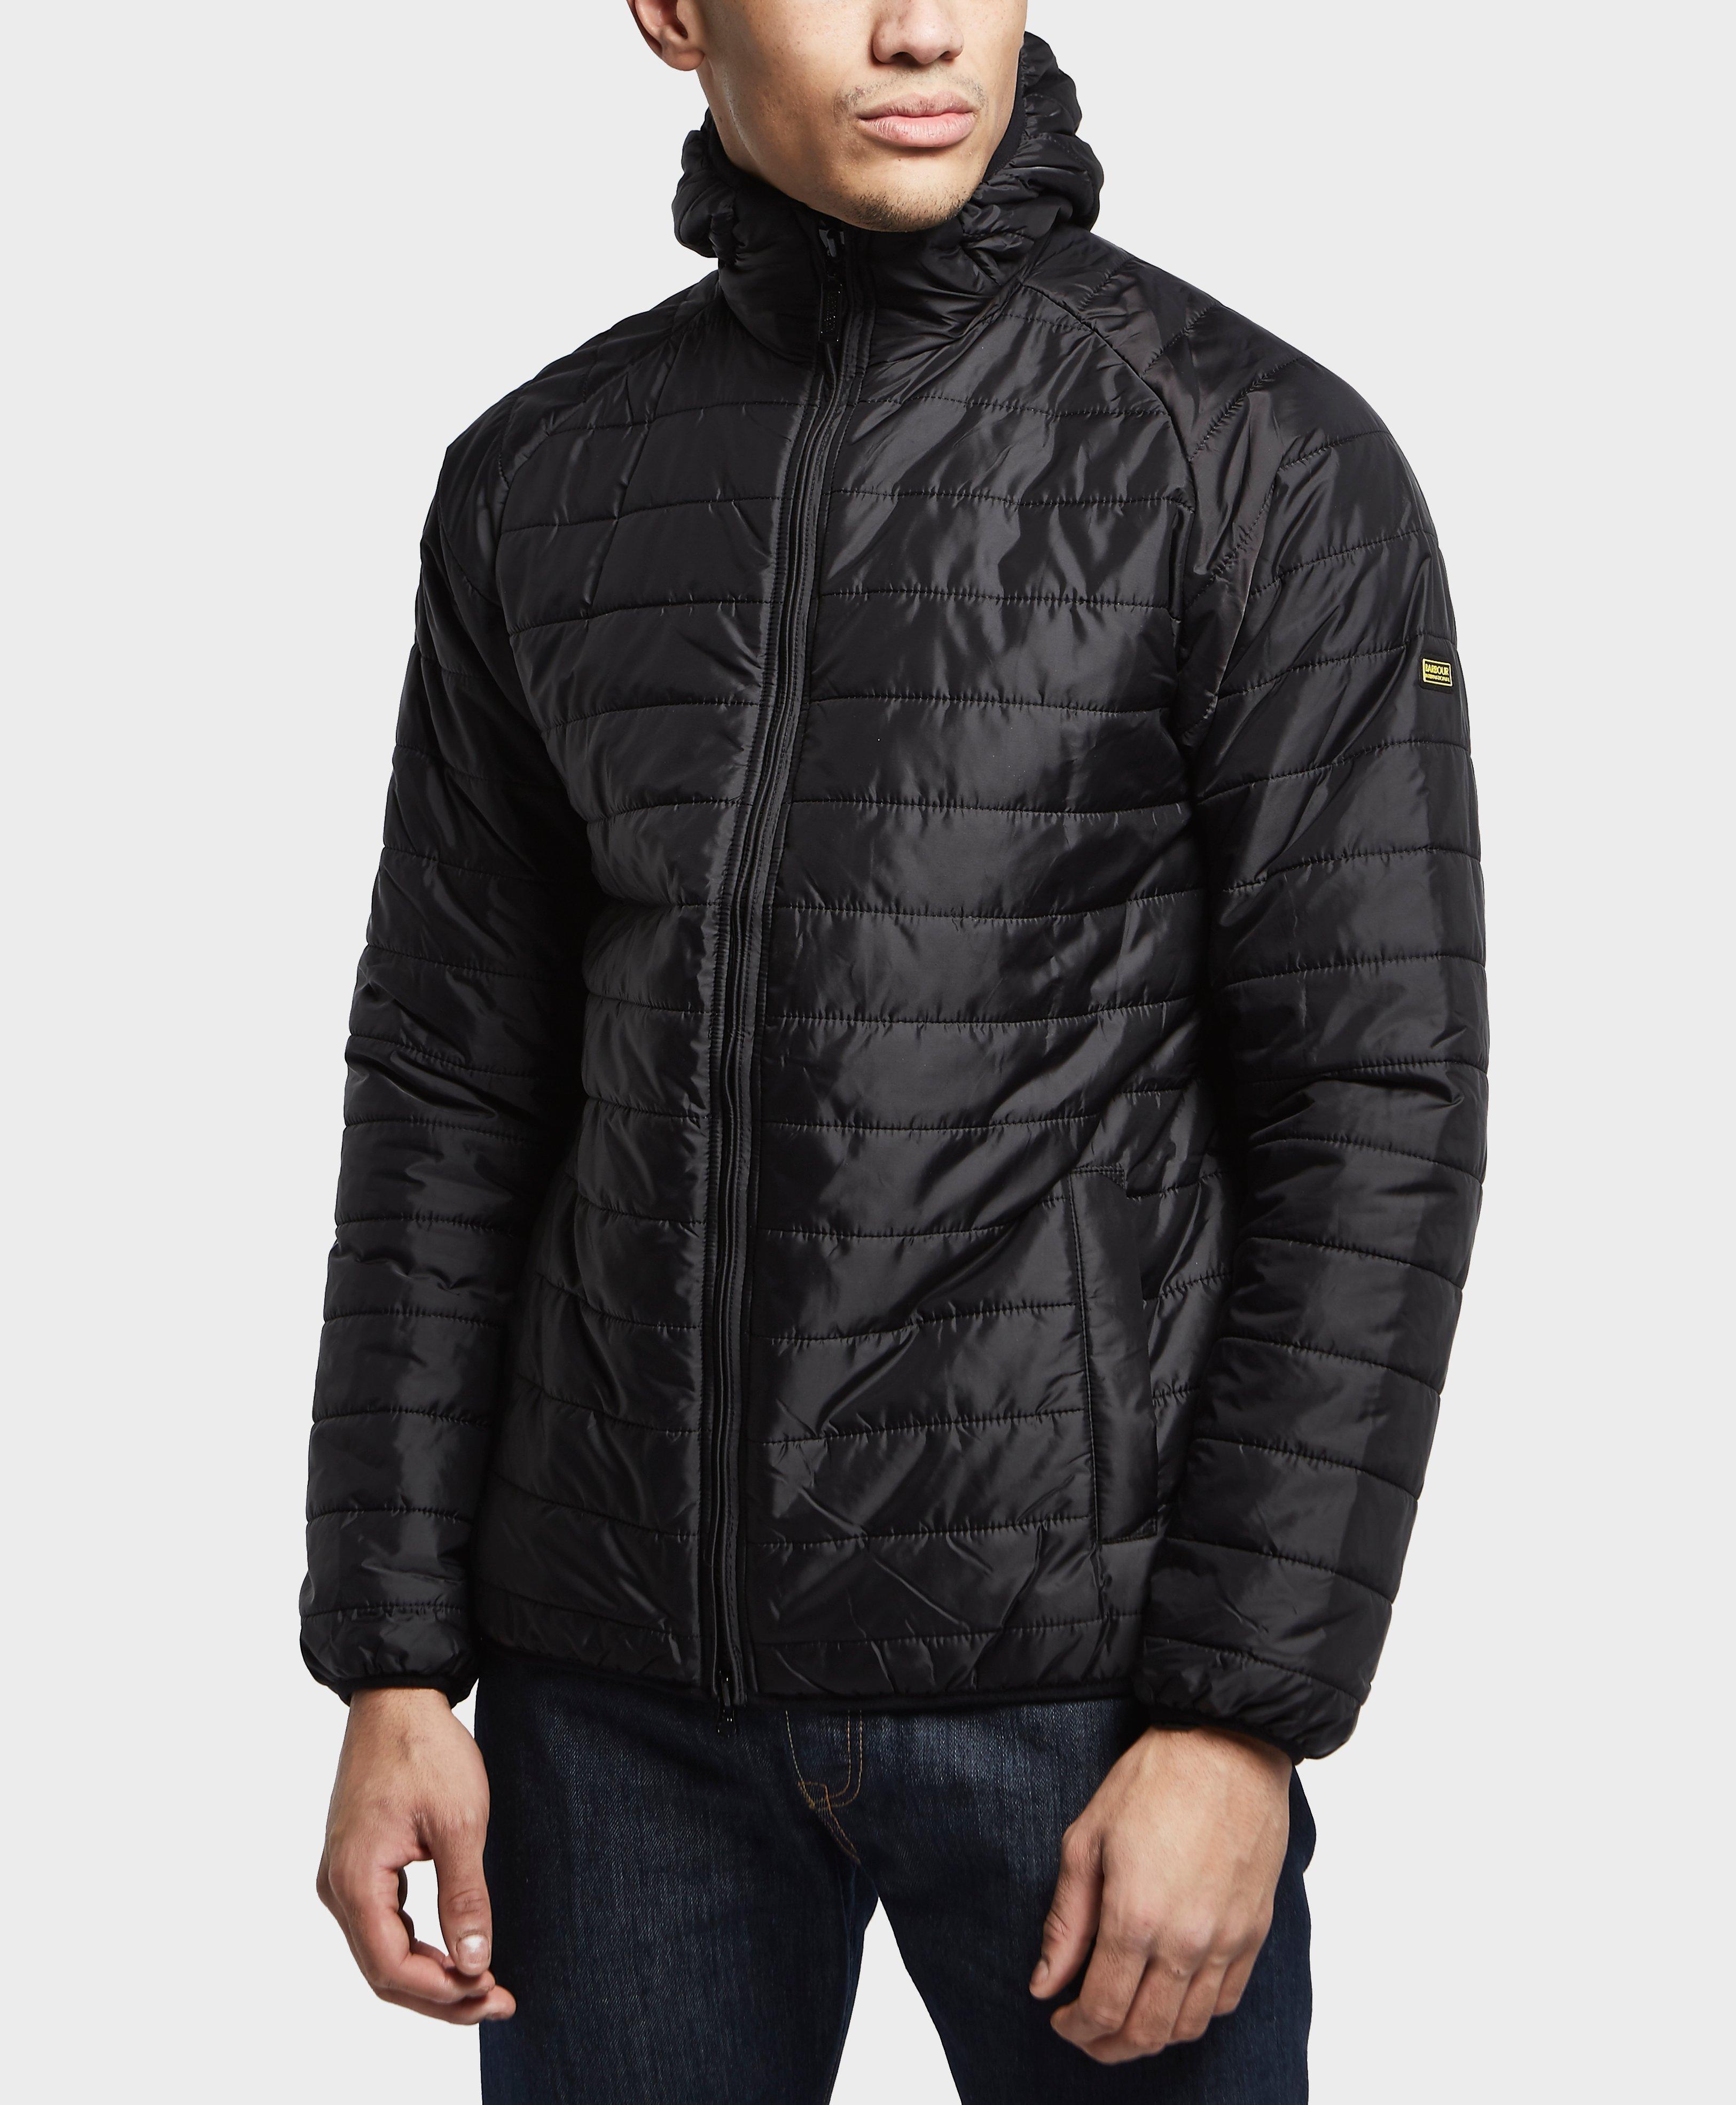 Lyst - Barbour International Level Quilted Padded Jacket in Black ... : mens black barbour quilted jacket - Adamdwight.com